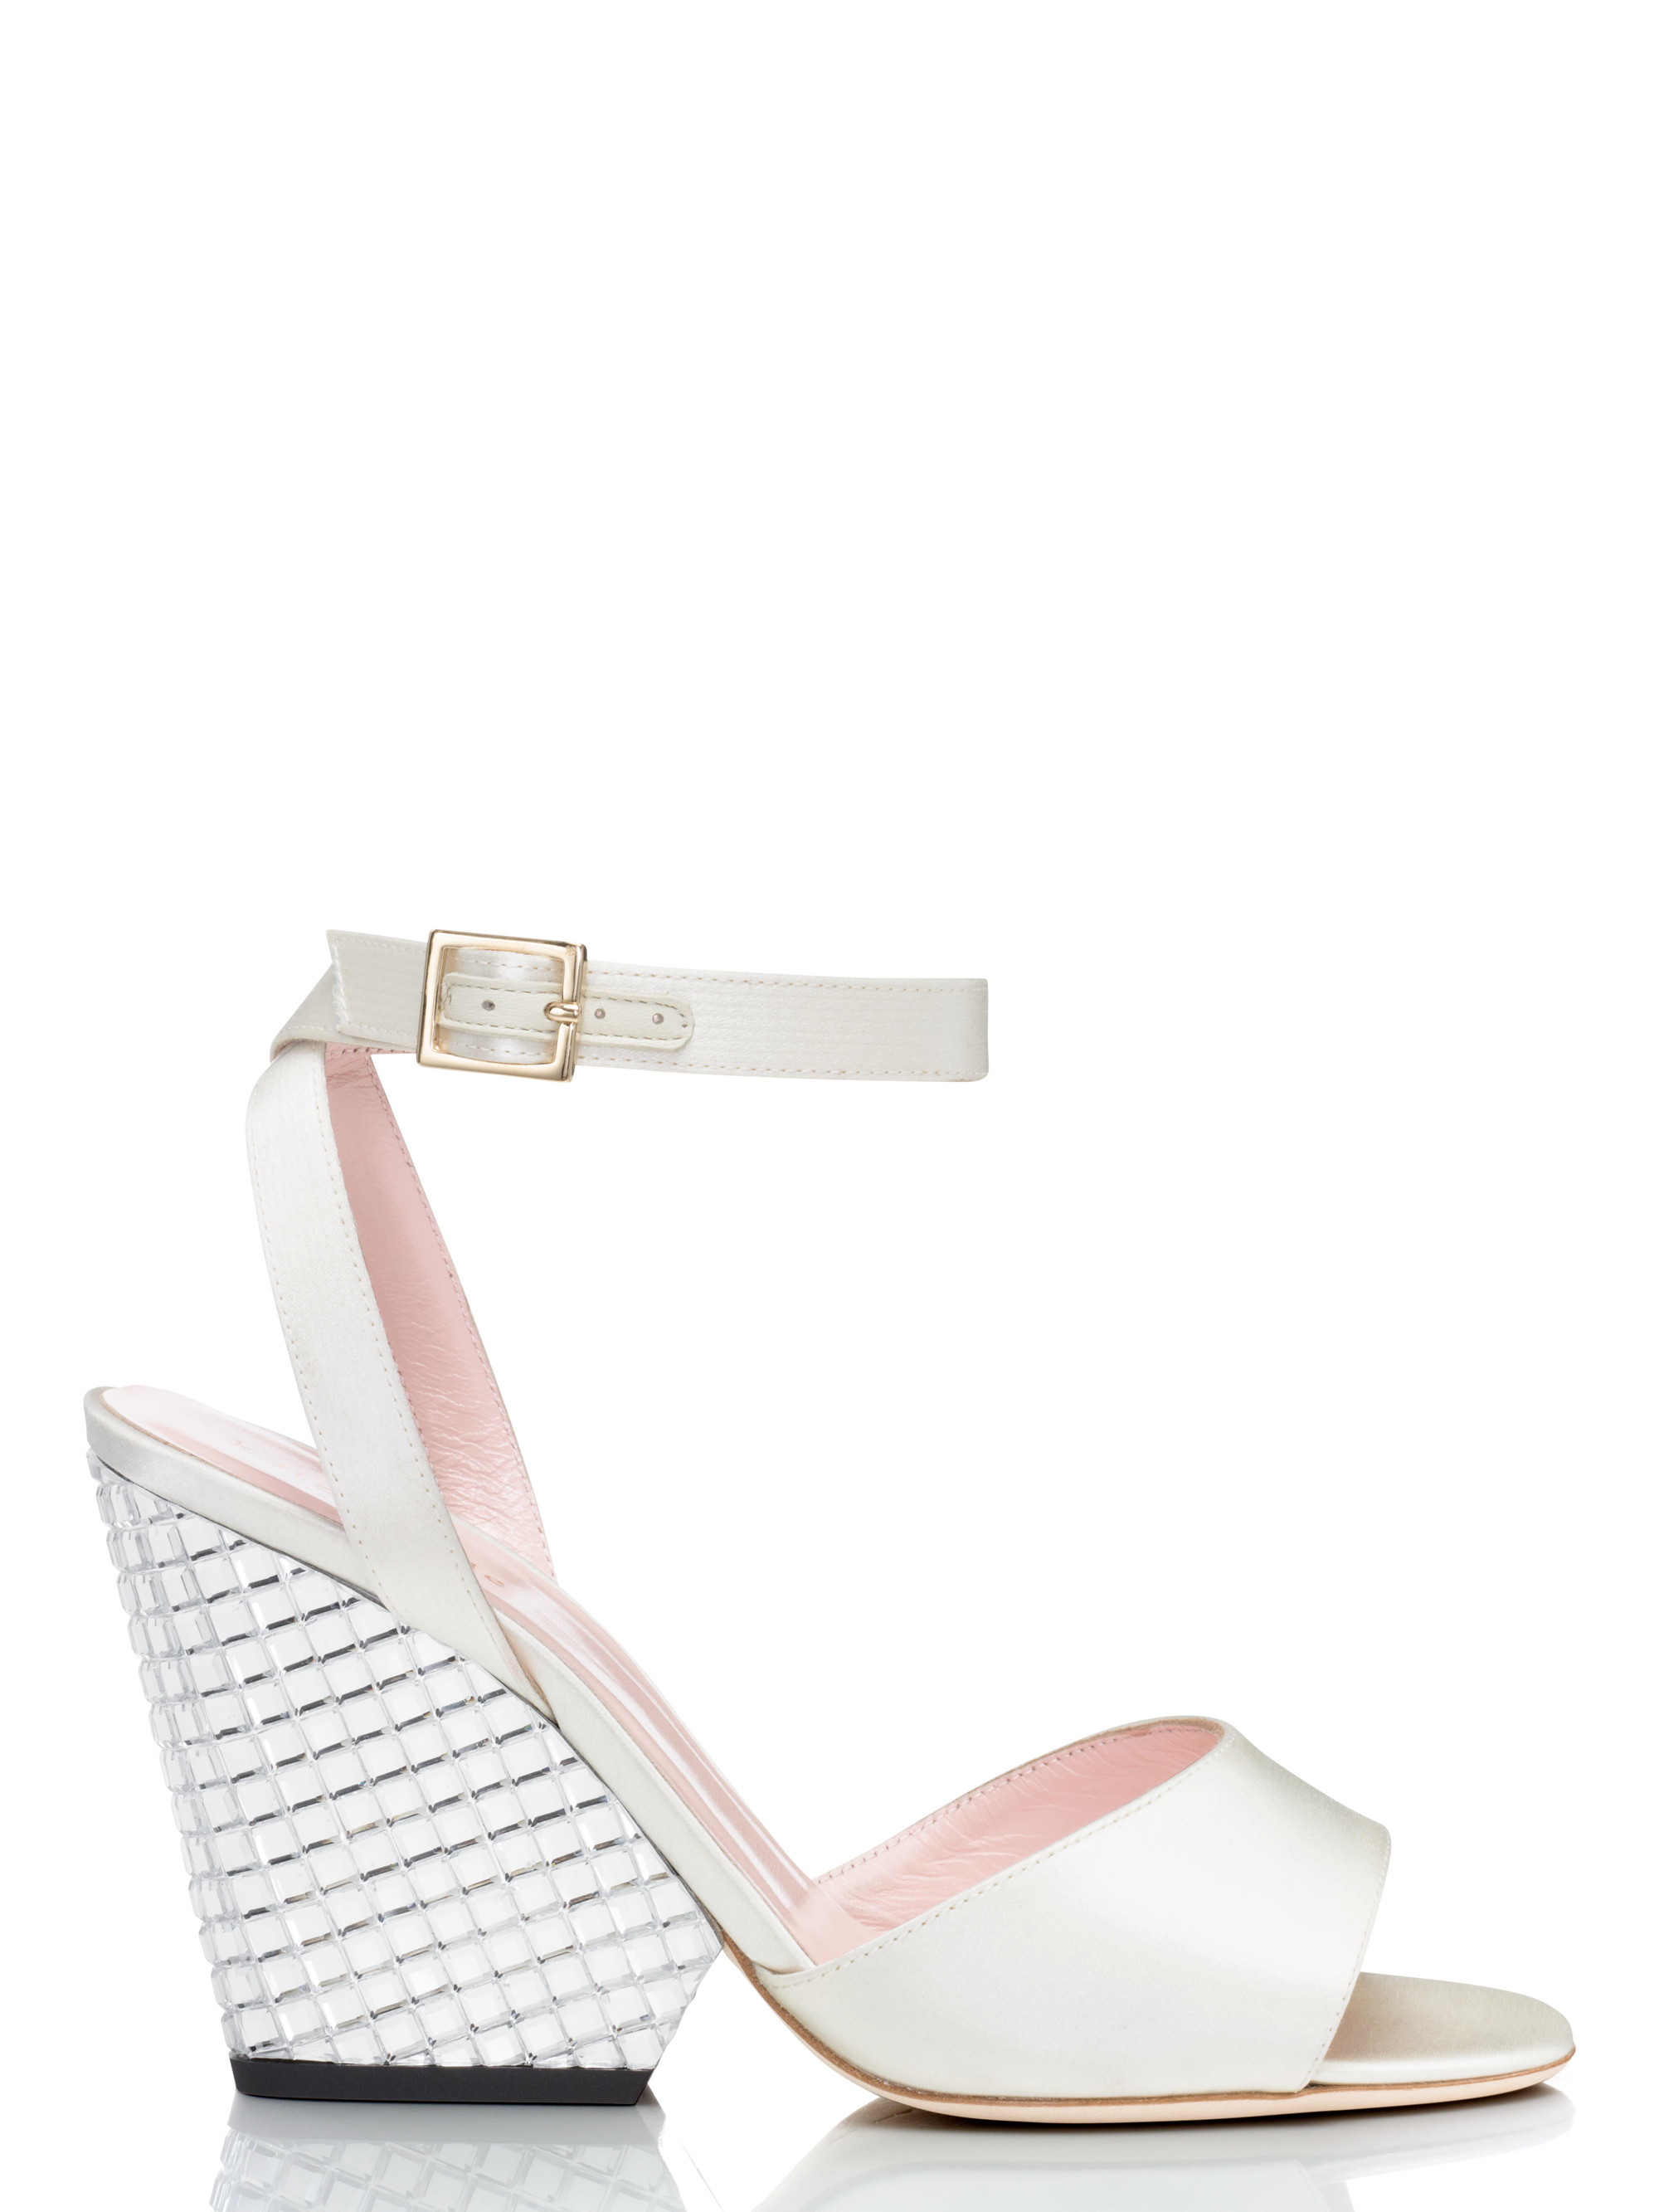 19880b9b6e00 Lyst - Kate Spade Isadora Heels in White